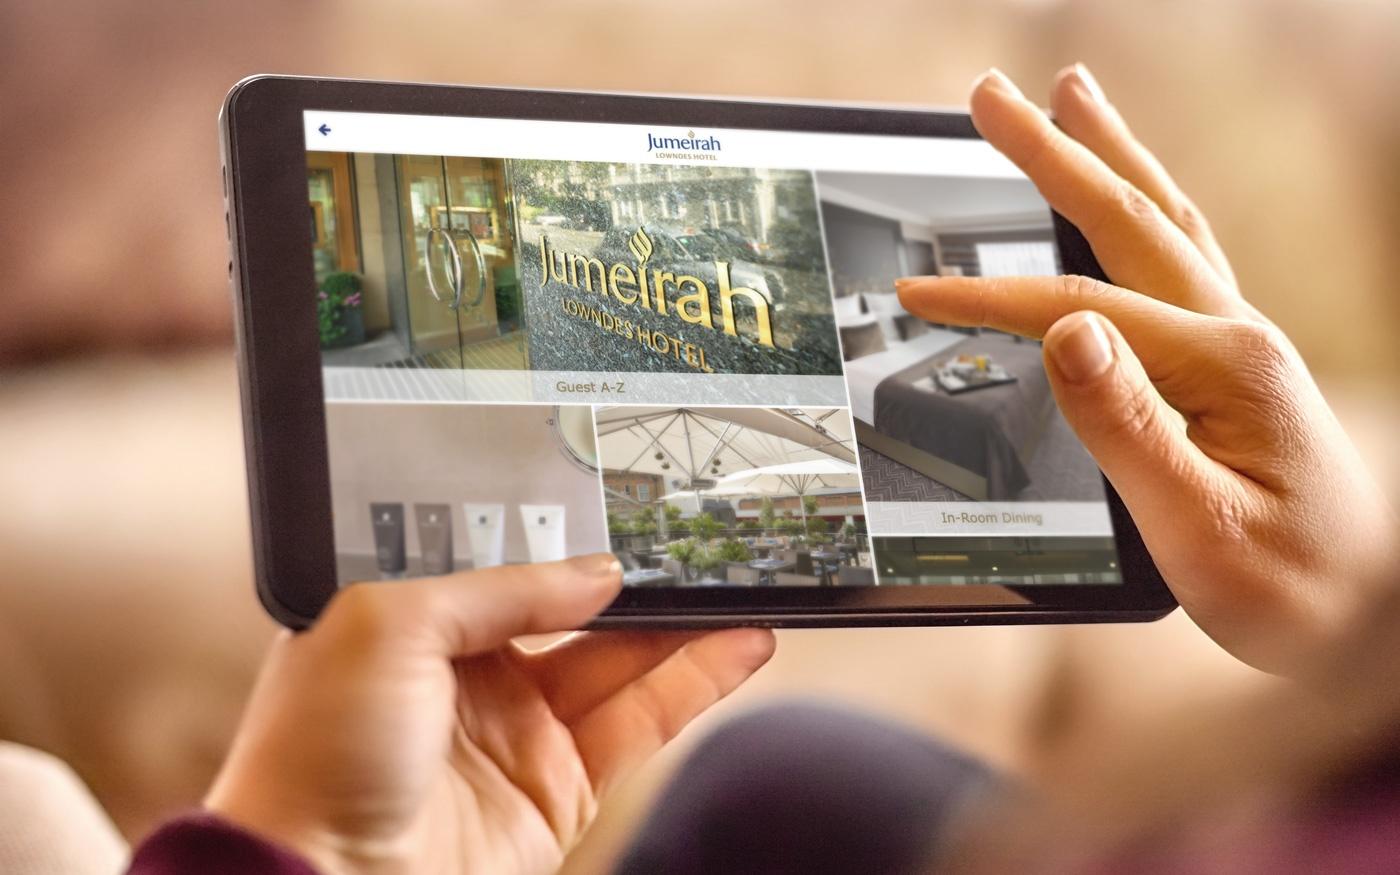 SuitePad's digital guest directory